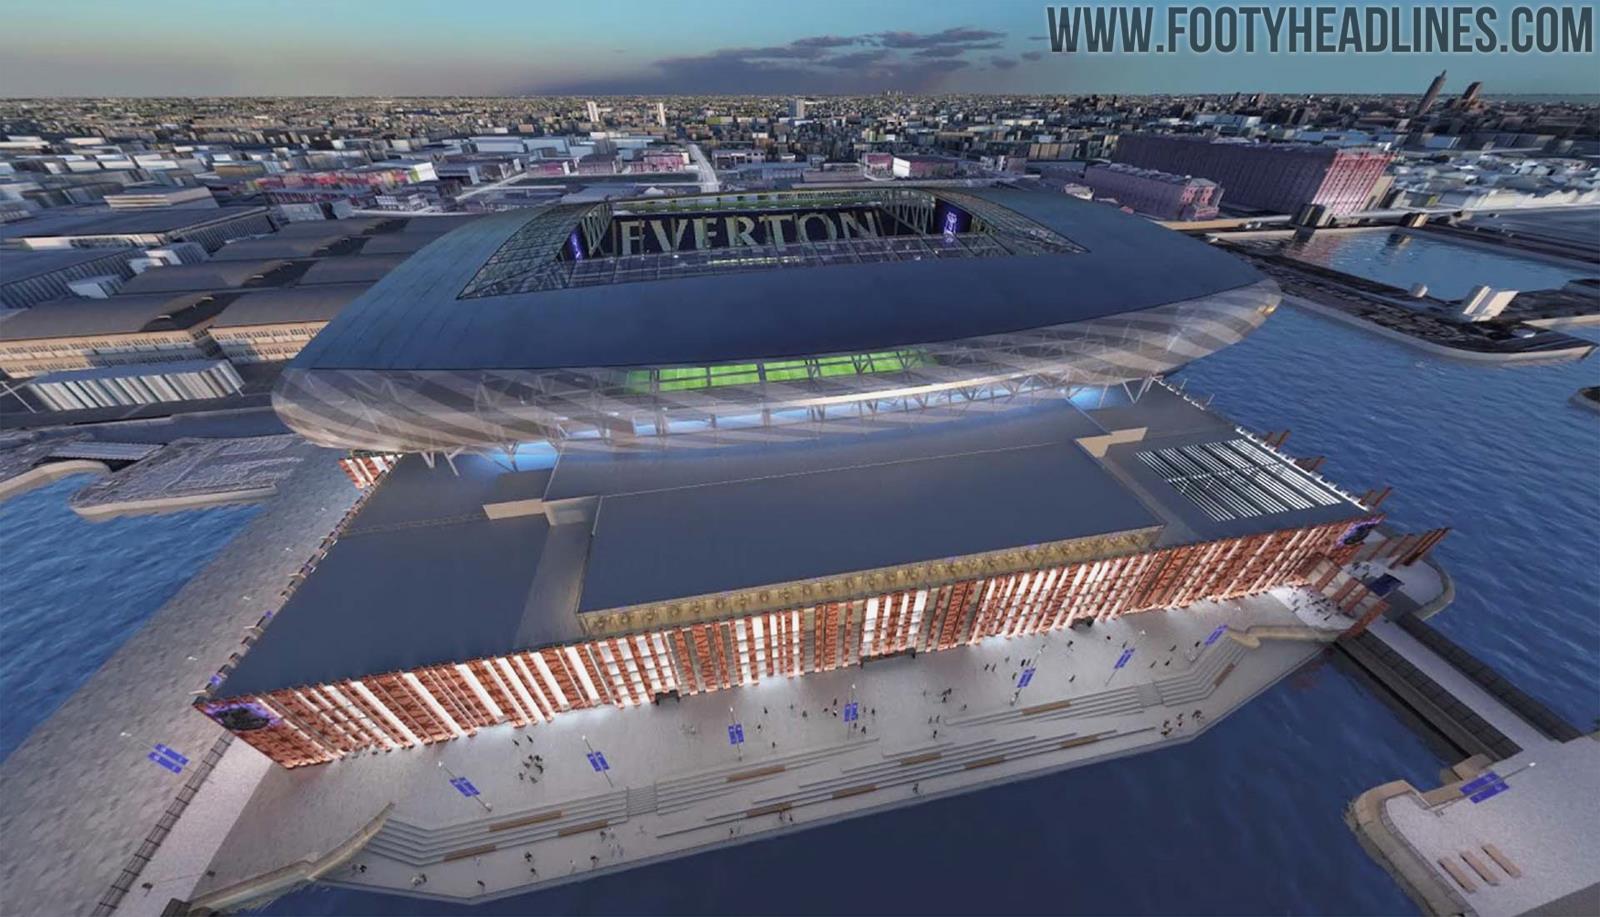 Everton Reveals Final New Stadium Design - Footy Headlines